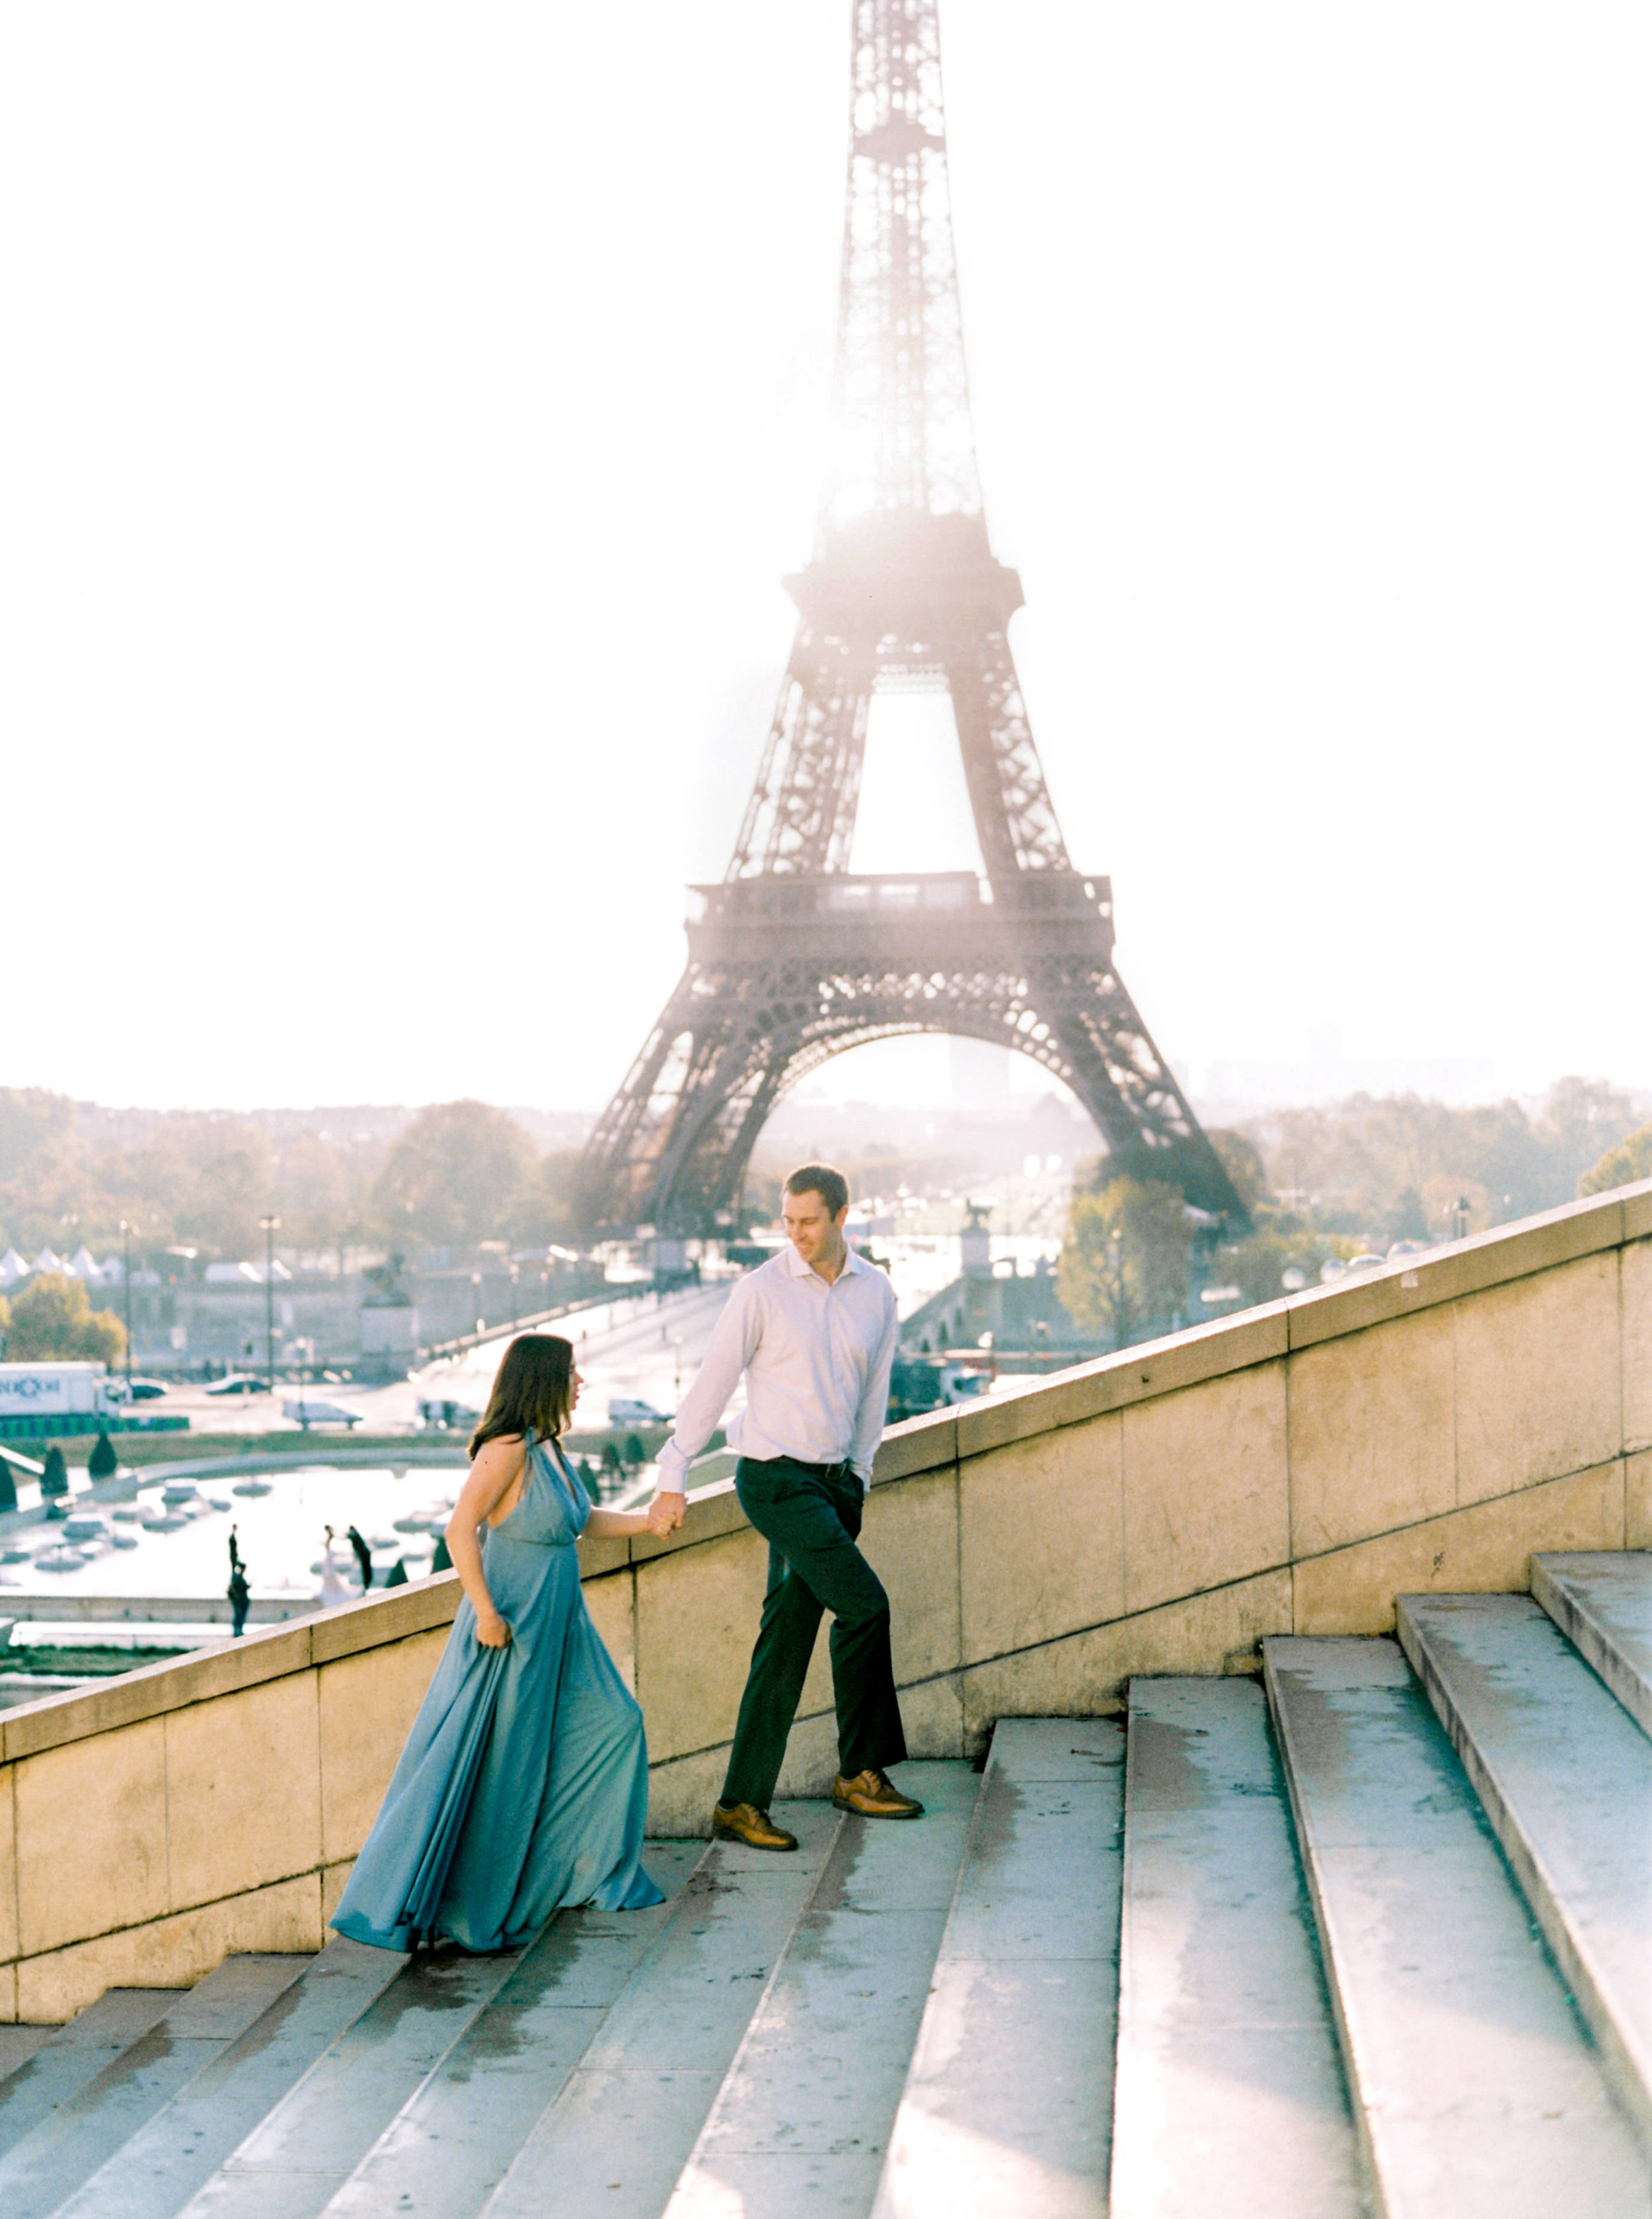 paris-france-wedding-photographer-destination-photographer-5.jpg